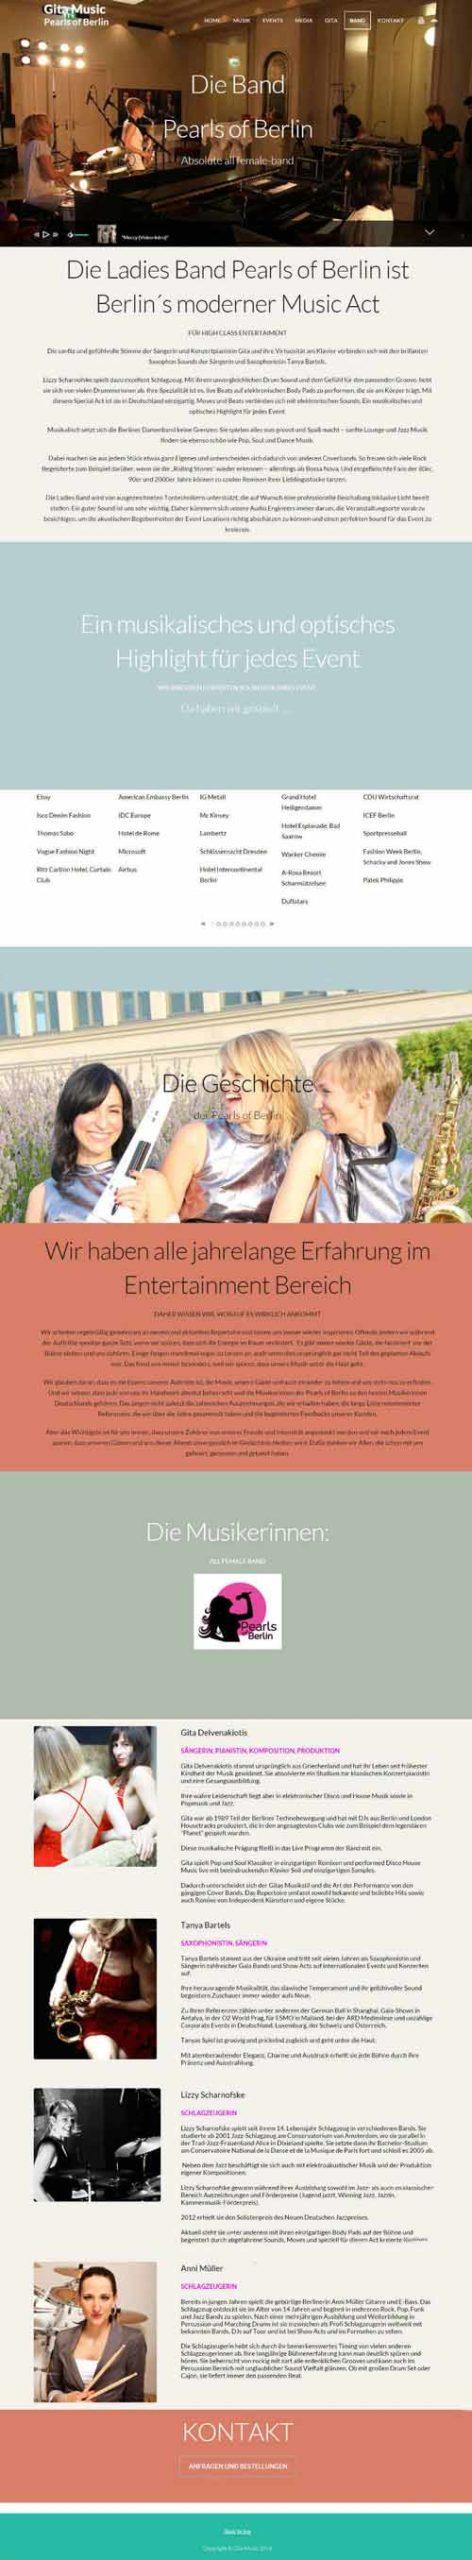 Band-LikeMyproject-webdesign-15